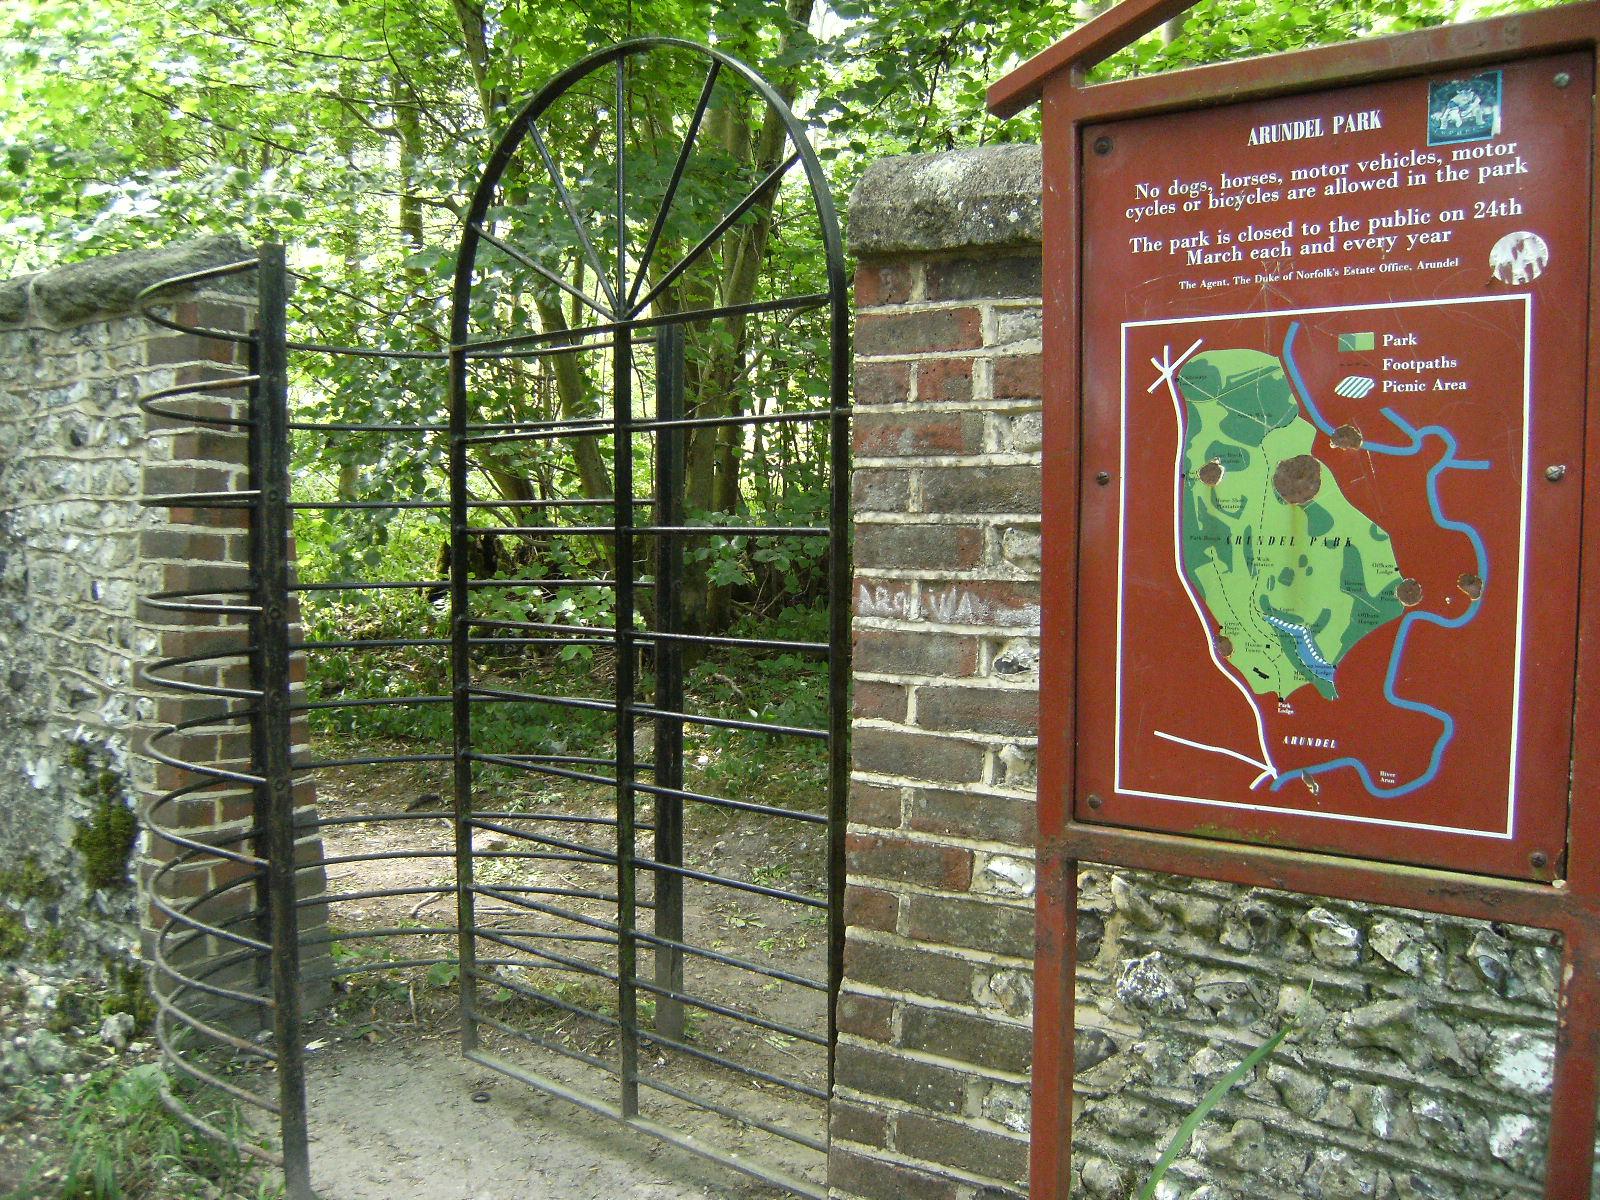 1007190036 Gate into Arundel Park